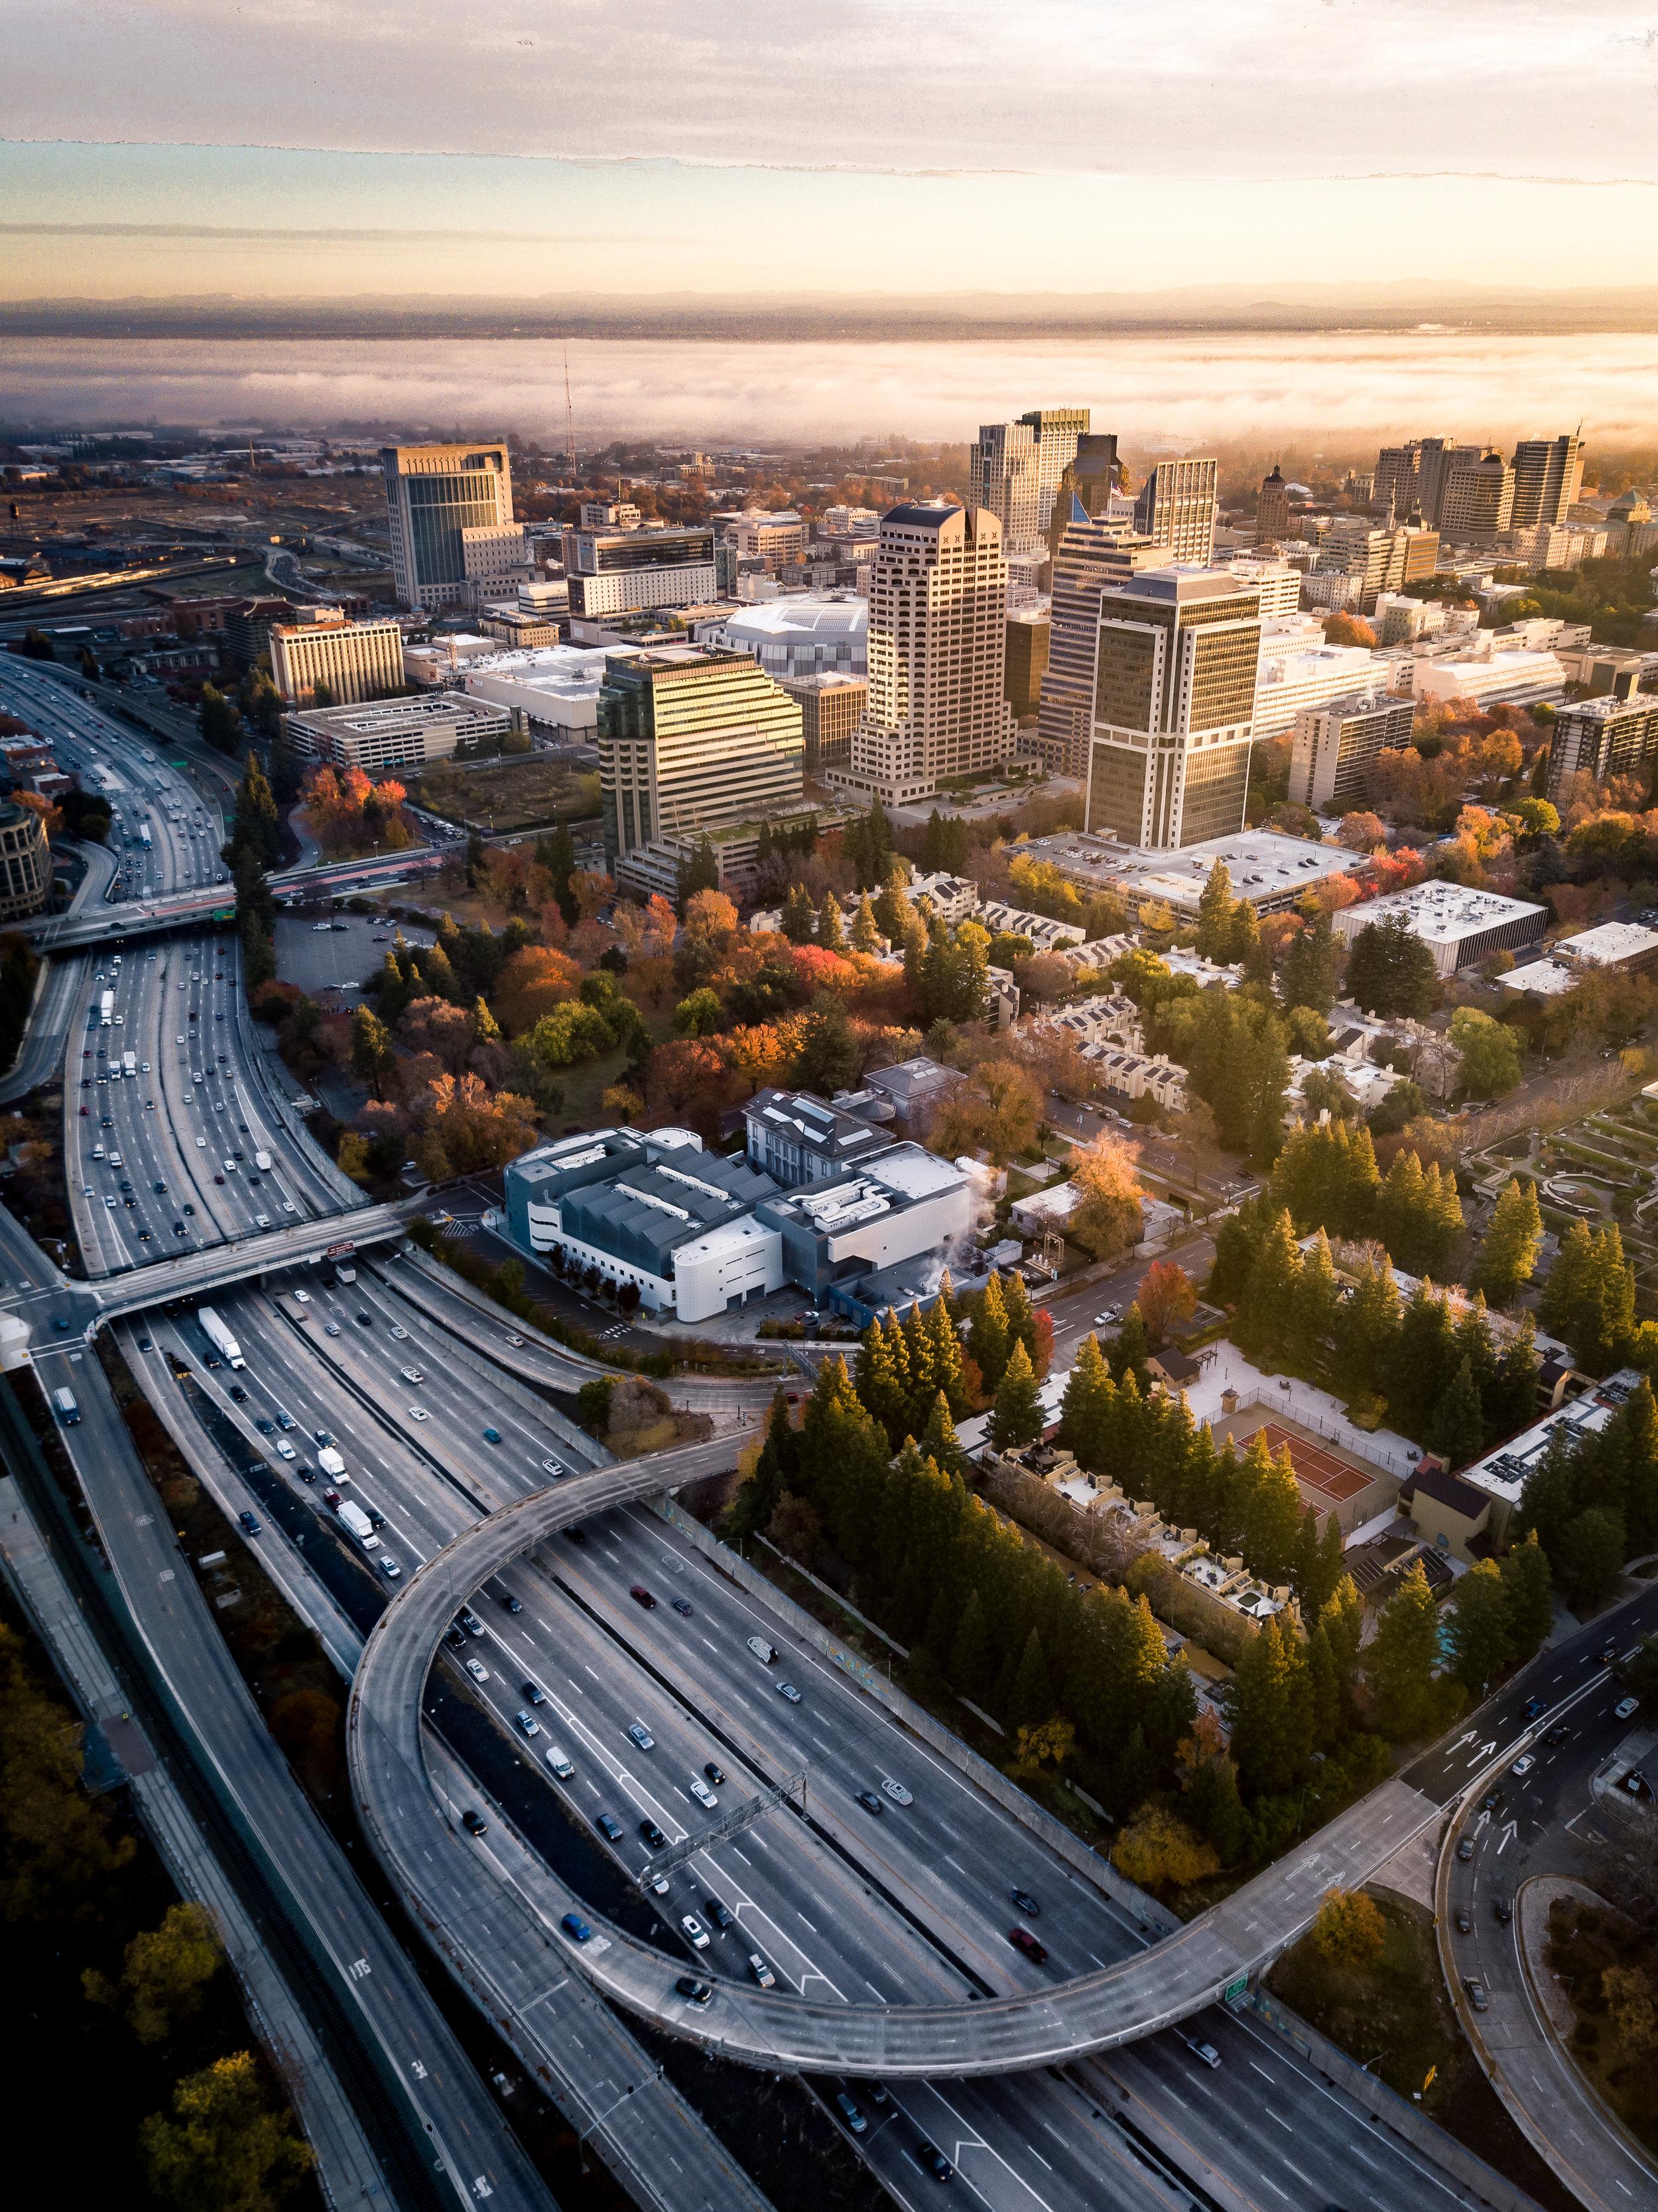 2018_12_03_Sacramento_Excursions_00010-HDR-3.jpg